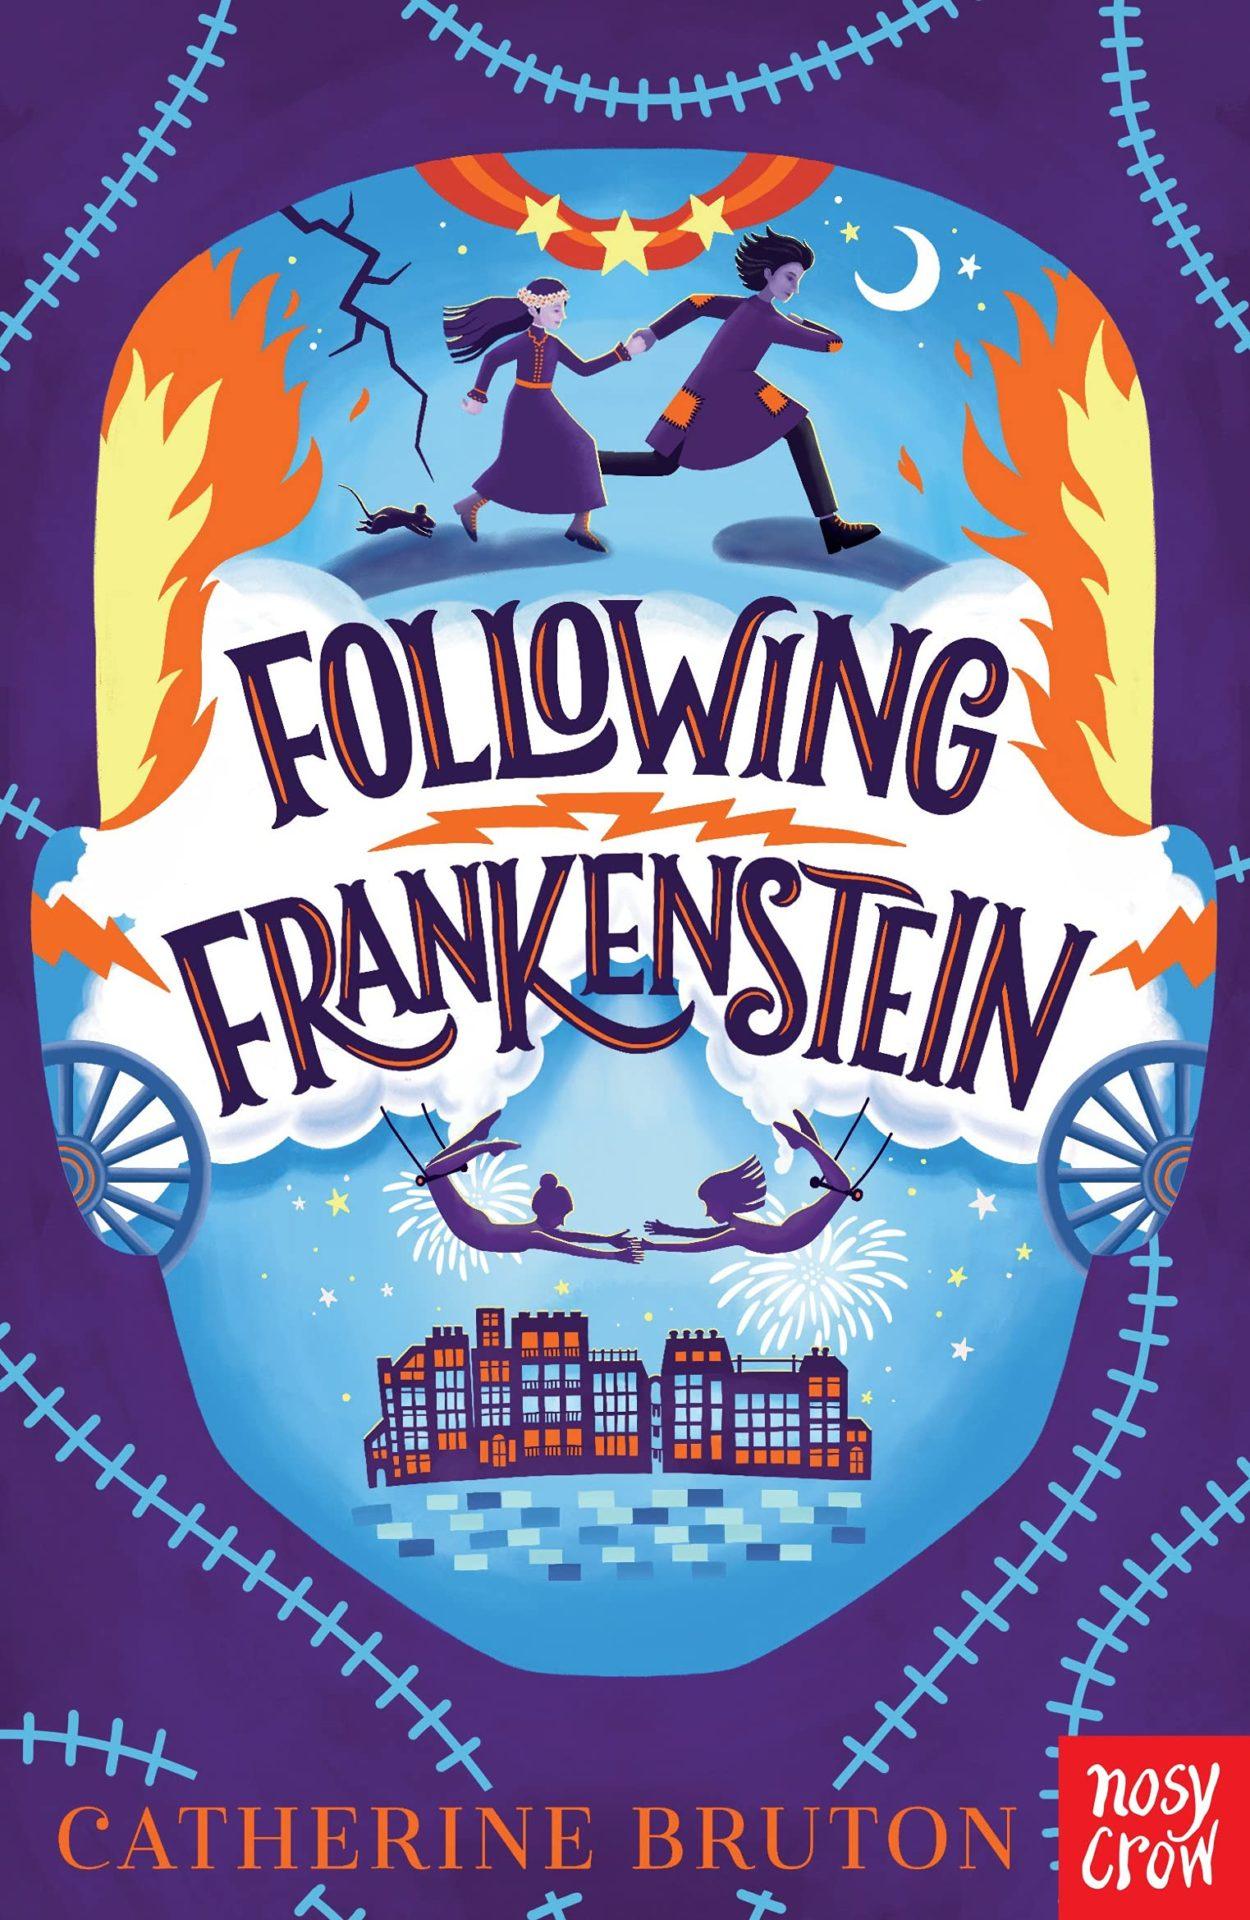 Following Frankenstein by Catherine Bruton | 9781788008440